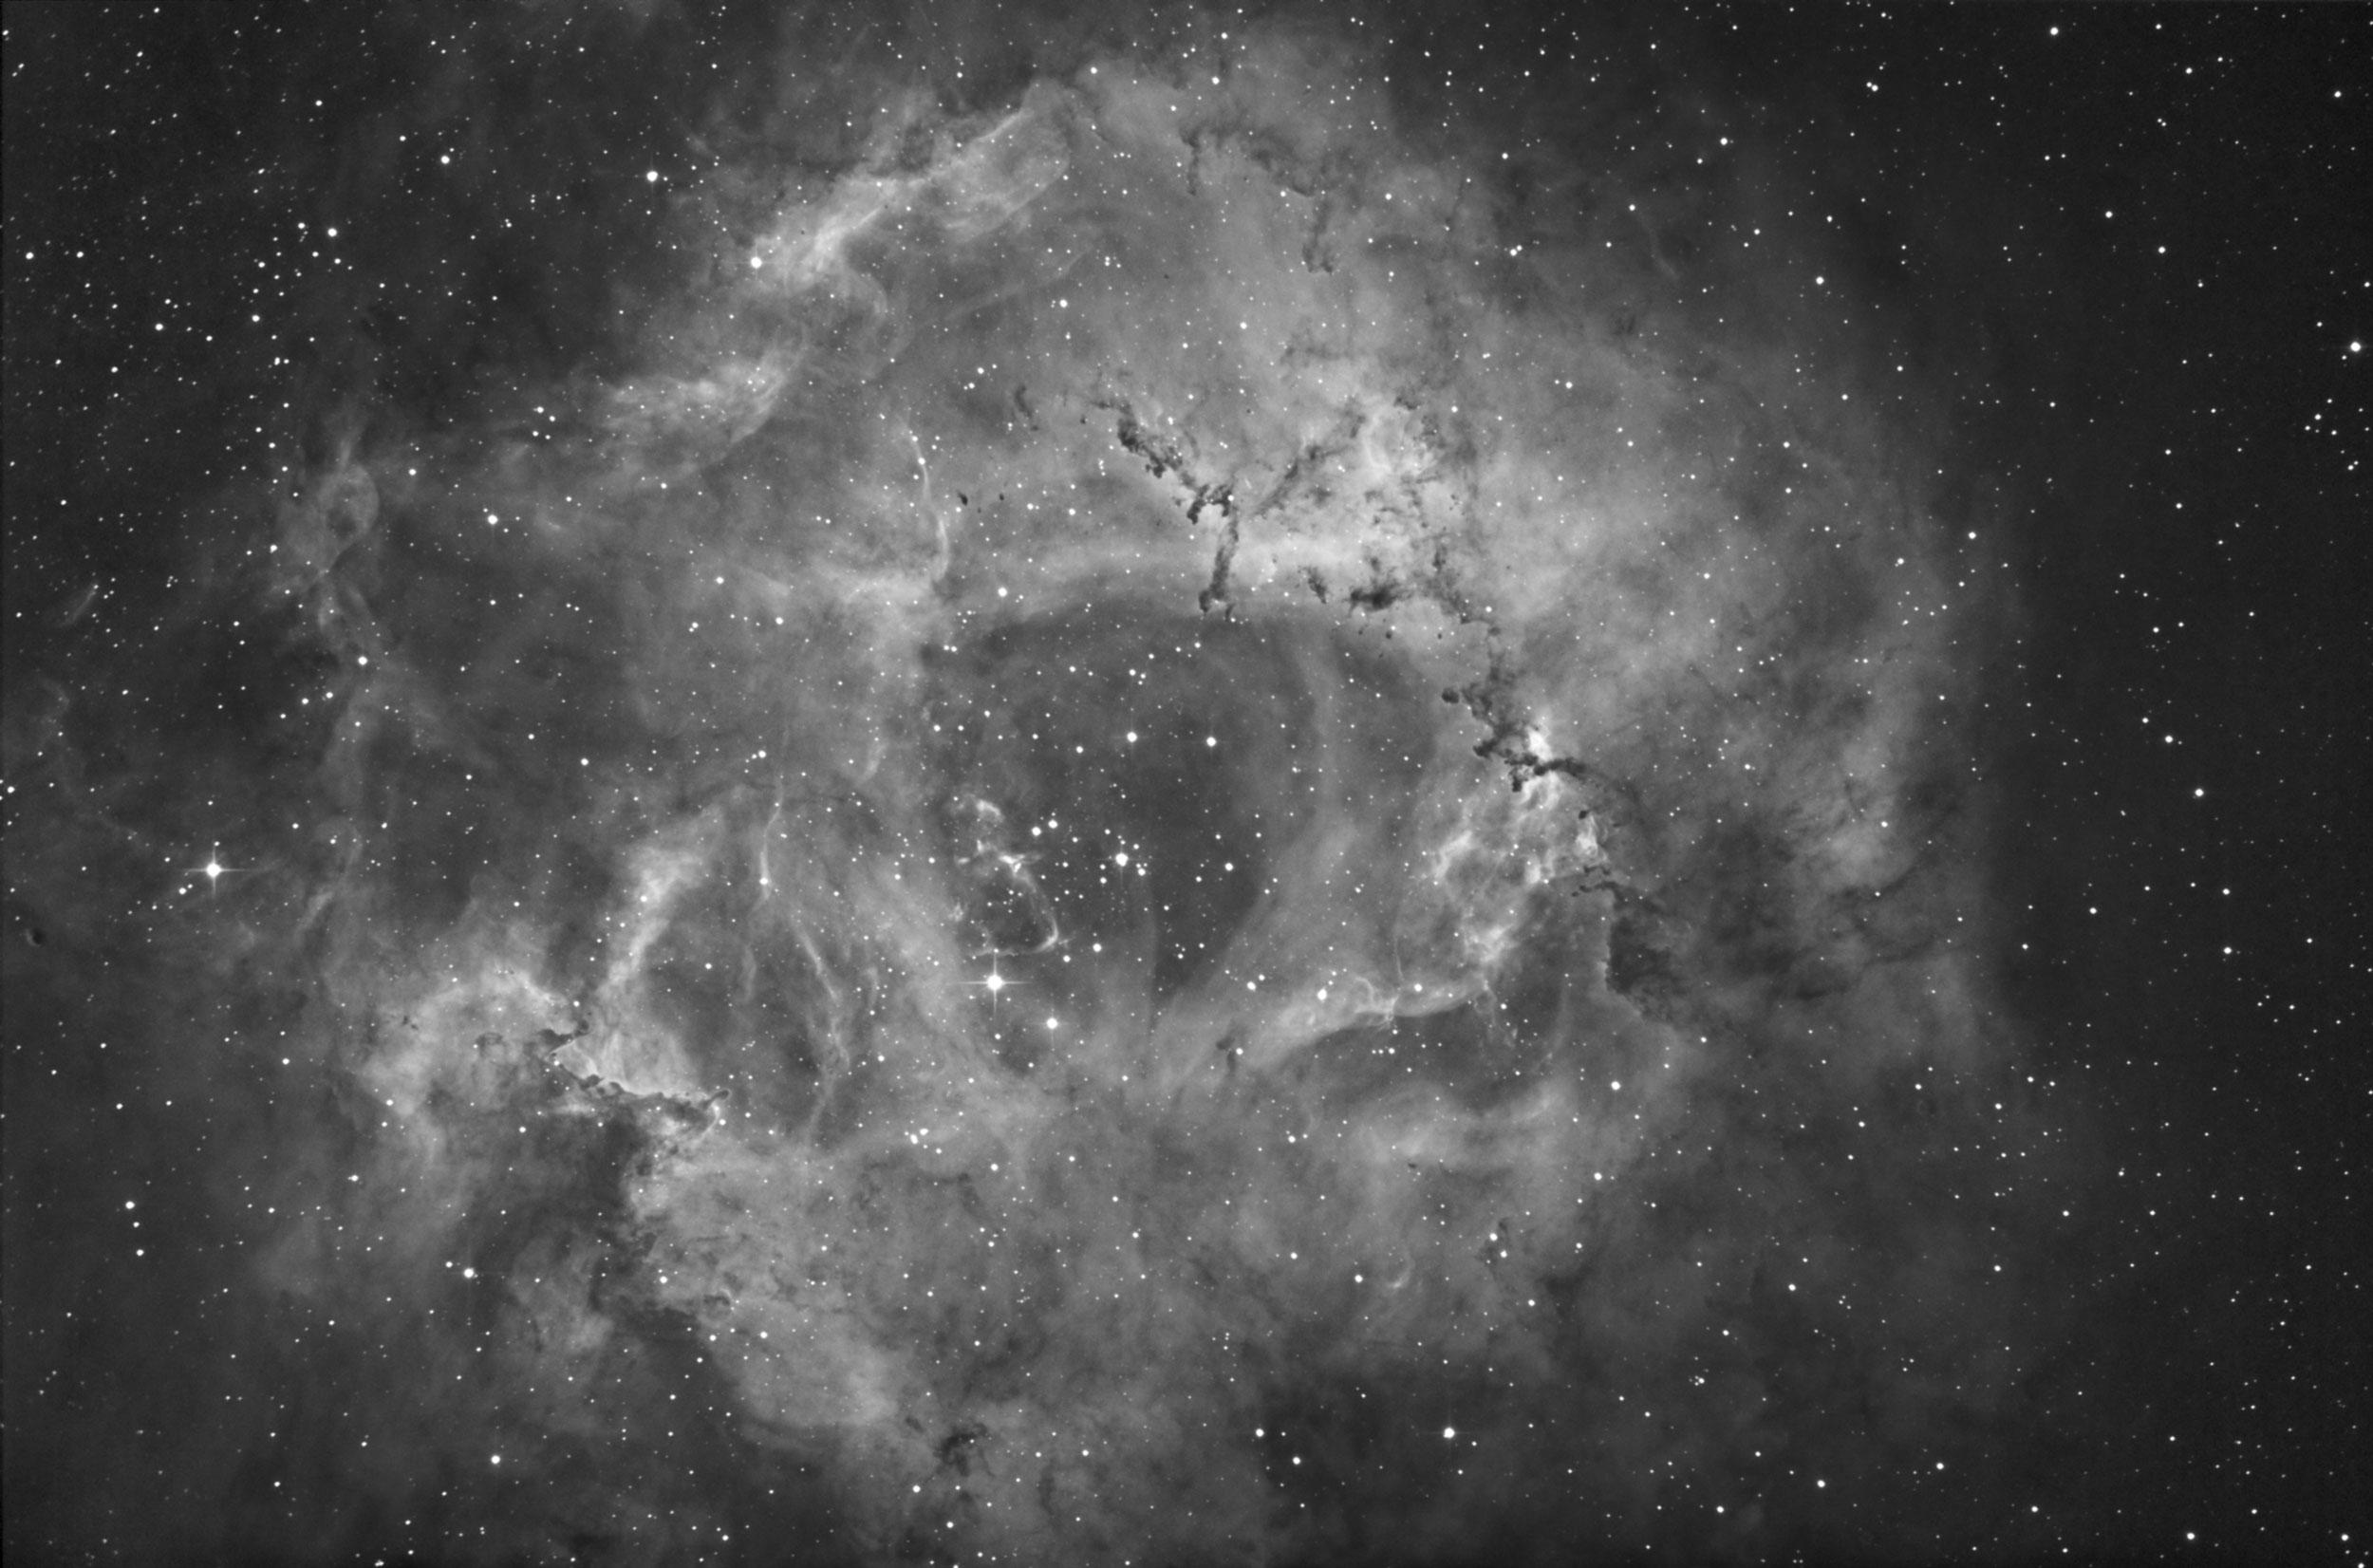 The Rosette Nebulaを撮りなおしてみた_c0061727_23371863.jpg